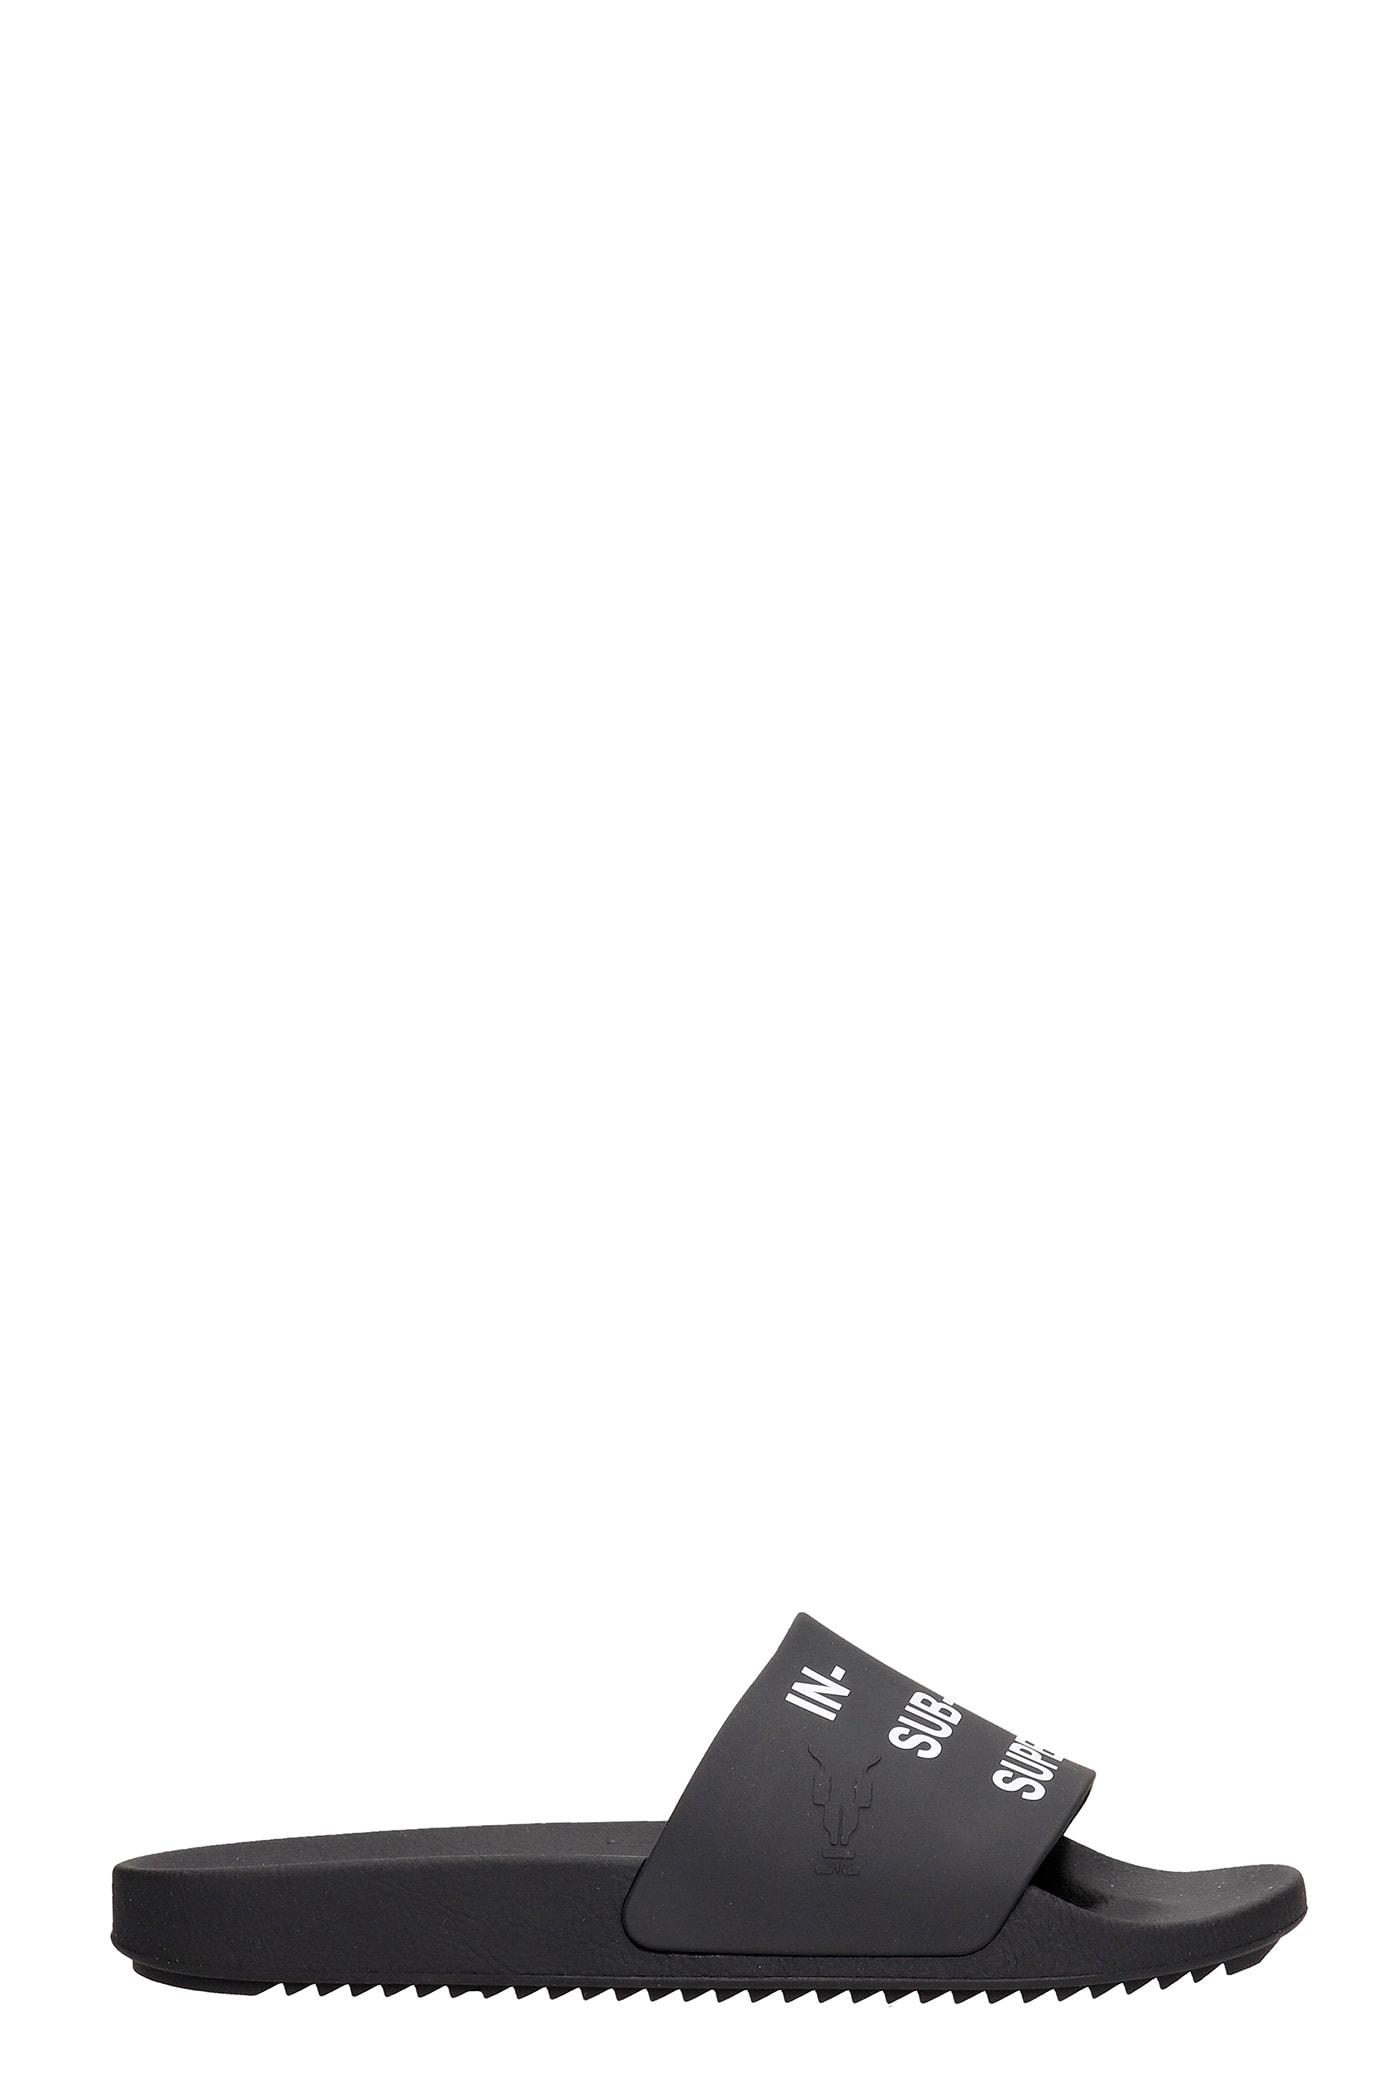 Flats In Black Rubber/plasic